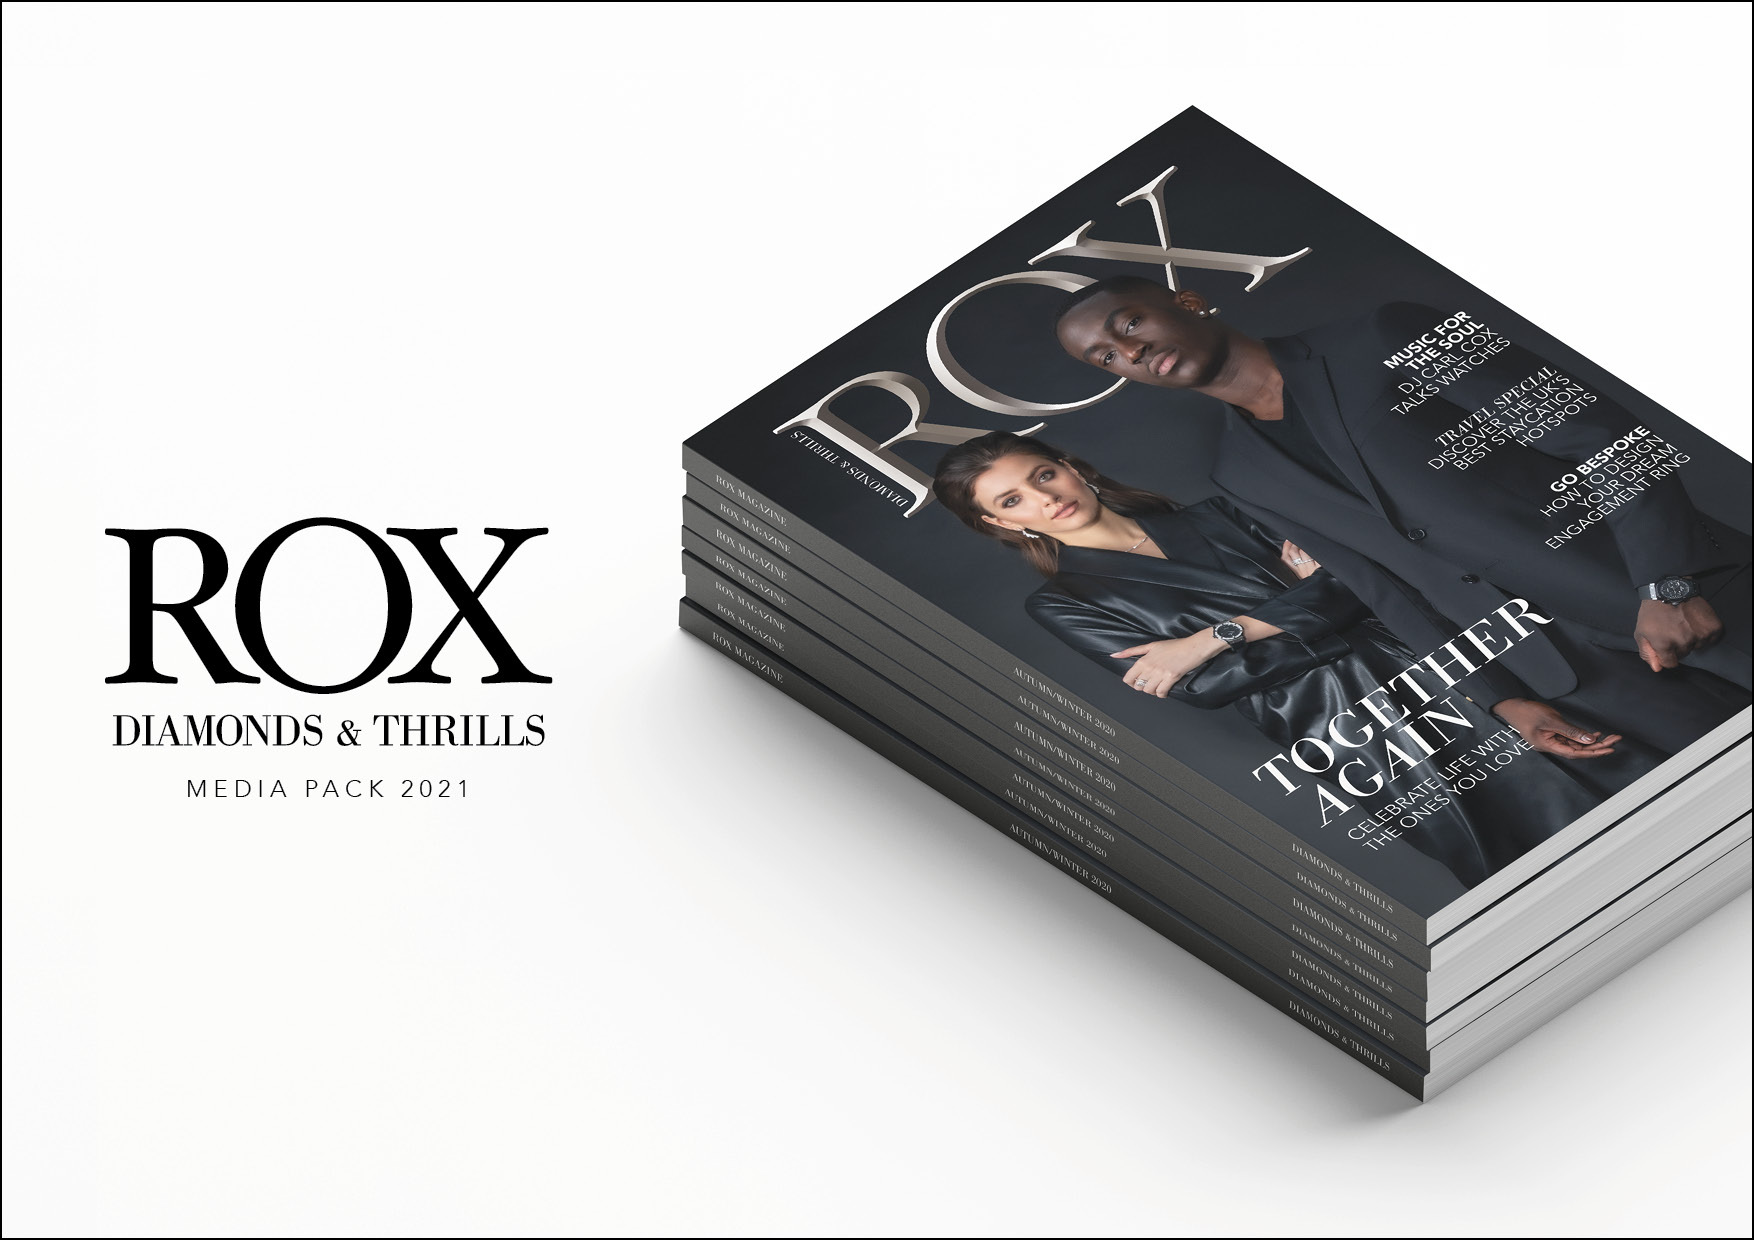 2021 ROX Media Pack